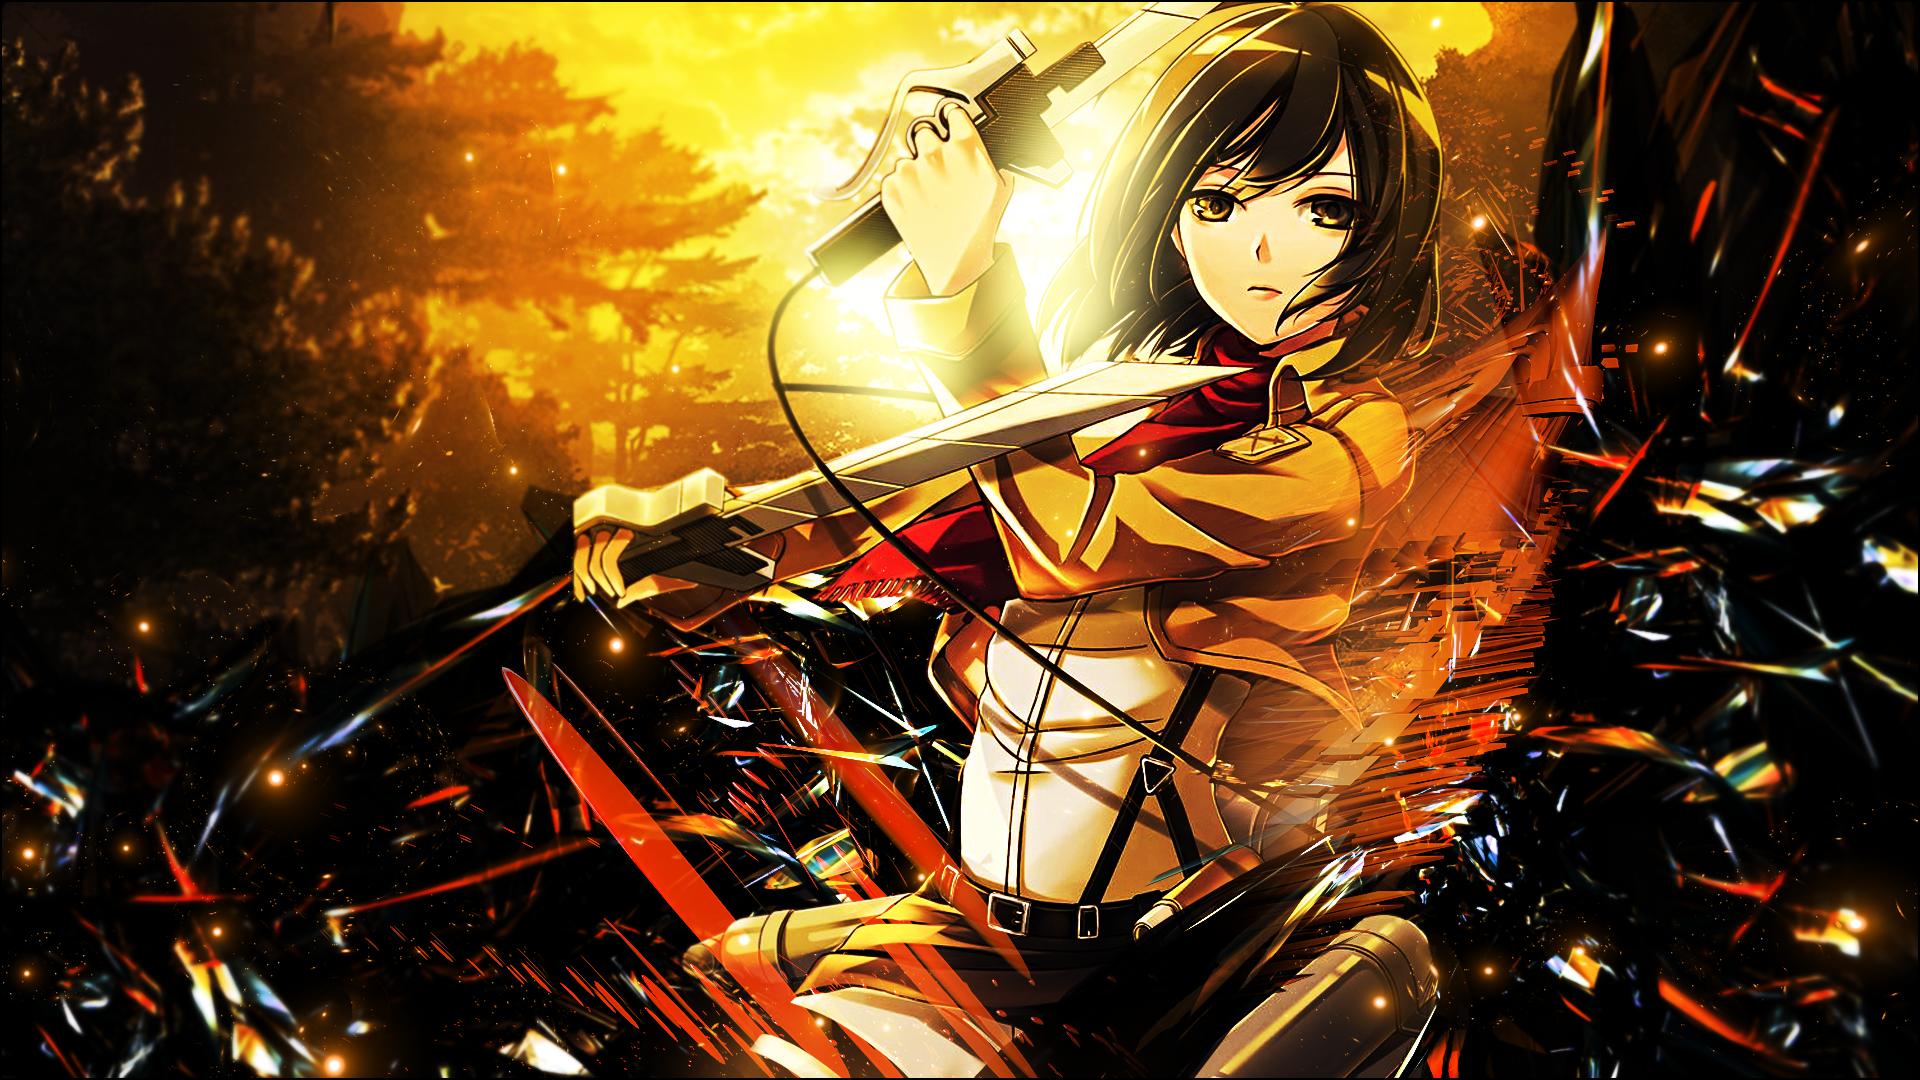 Mikasa Ackerman Hd Wallpaper Background Image 1920x1080